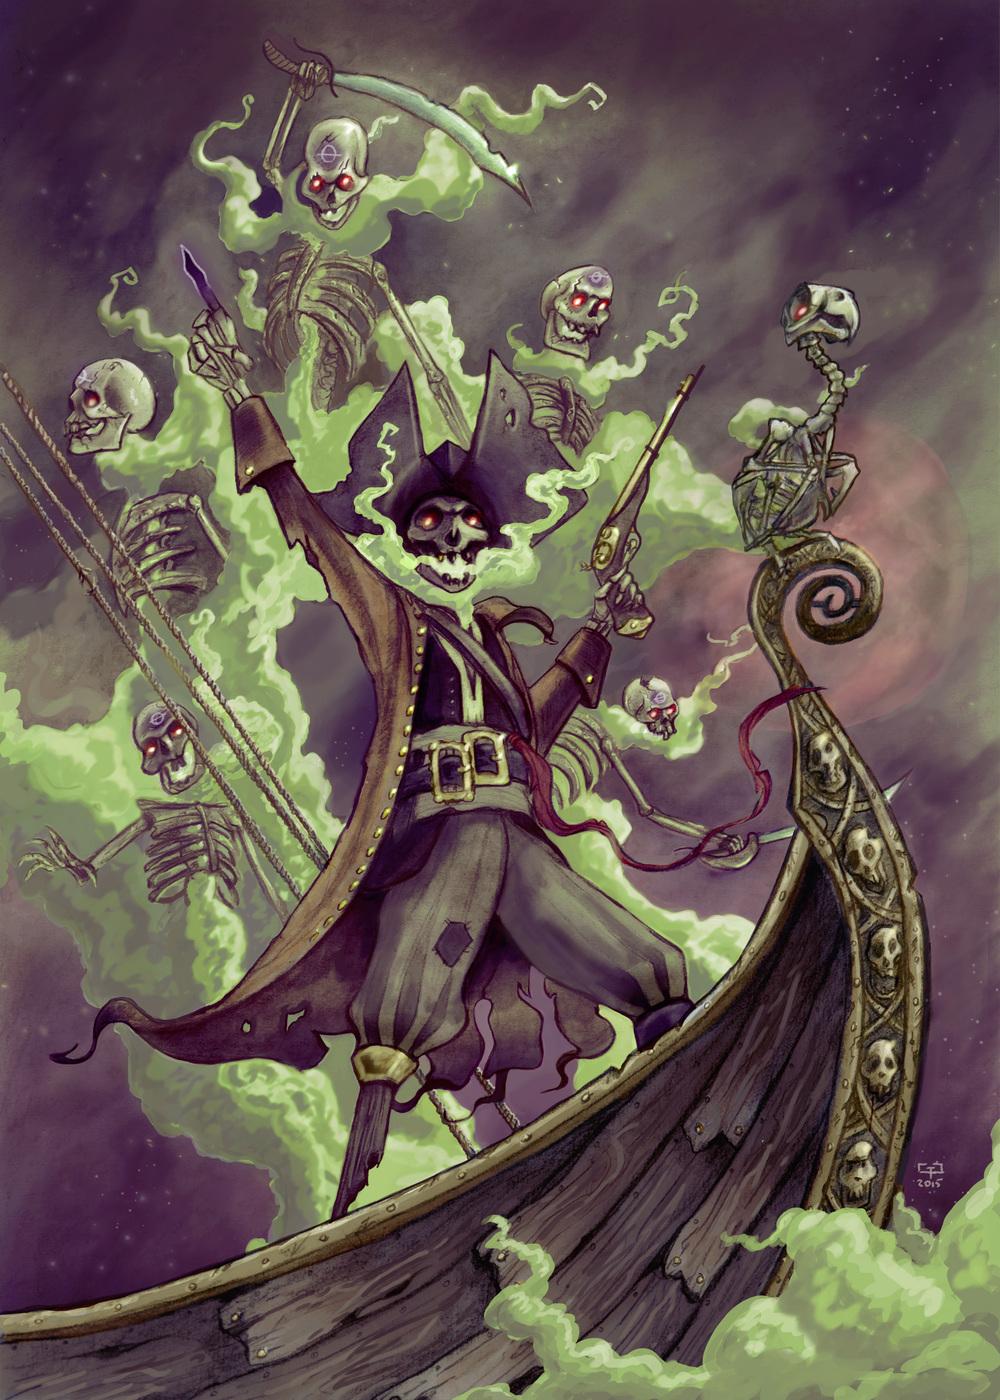 captain_blackfinger_by_gavin_gray_valentine.jpg